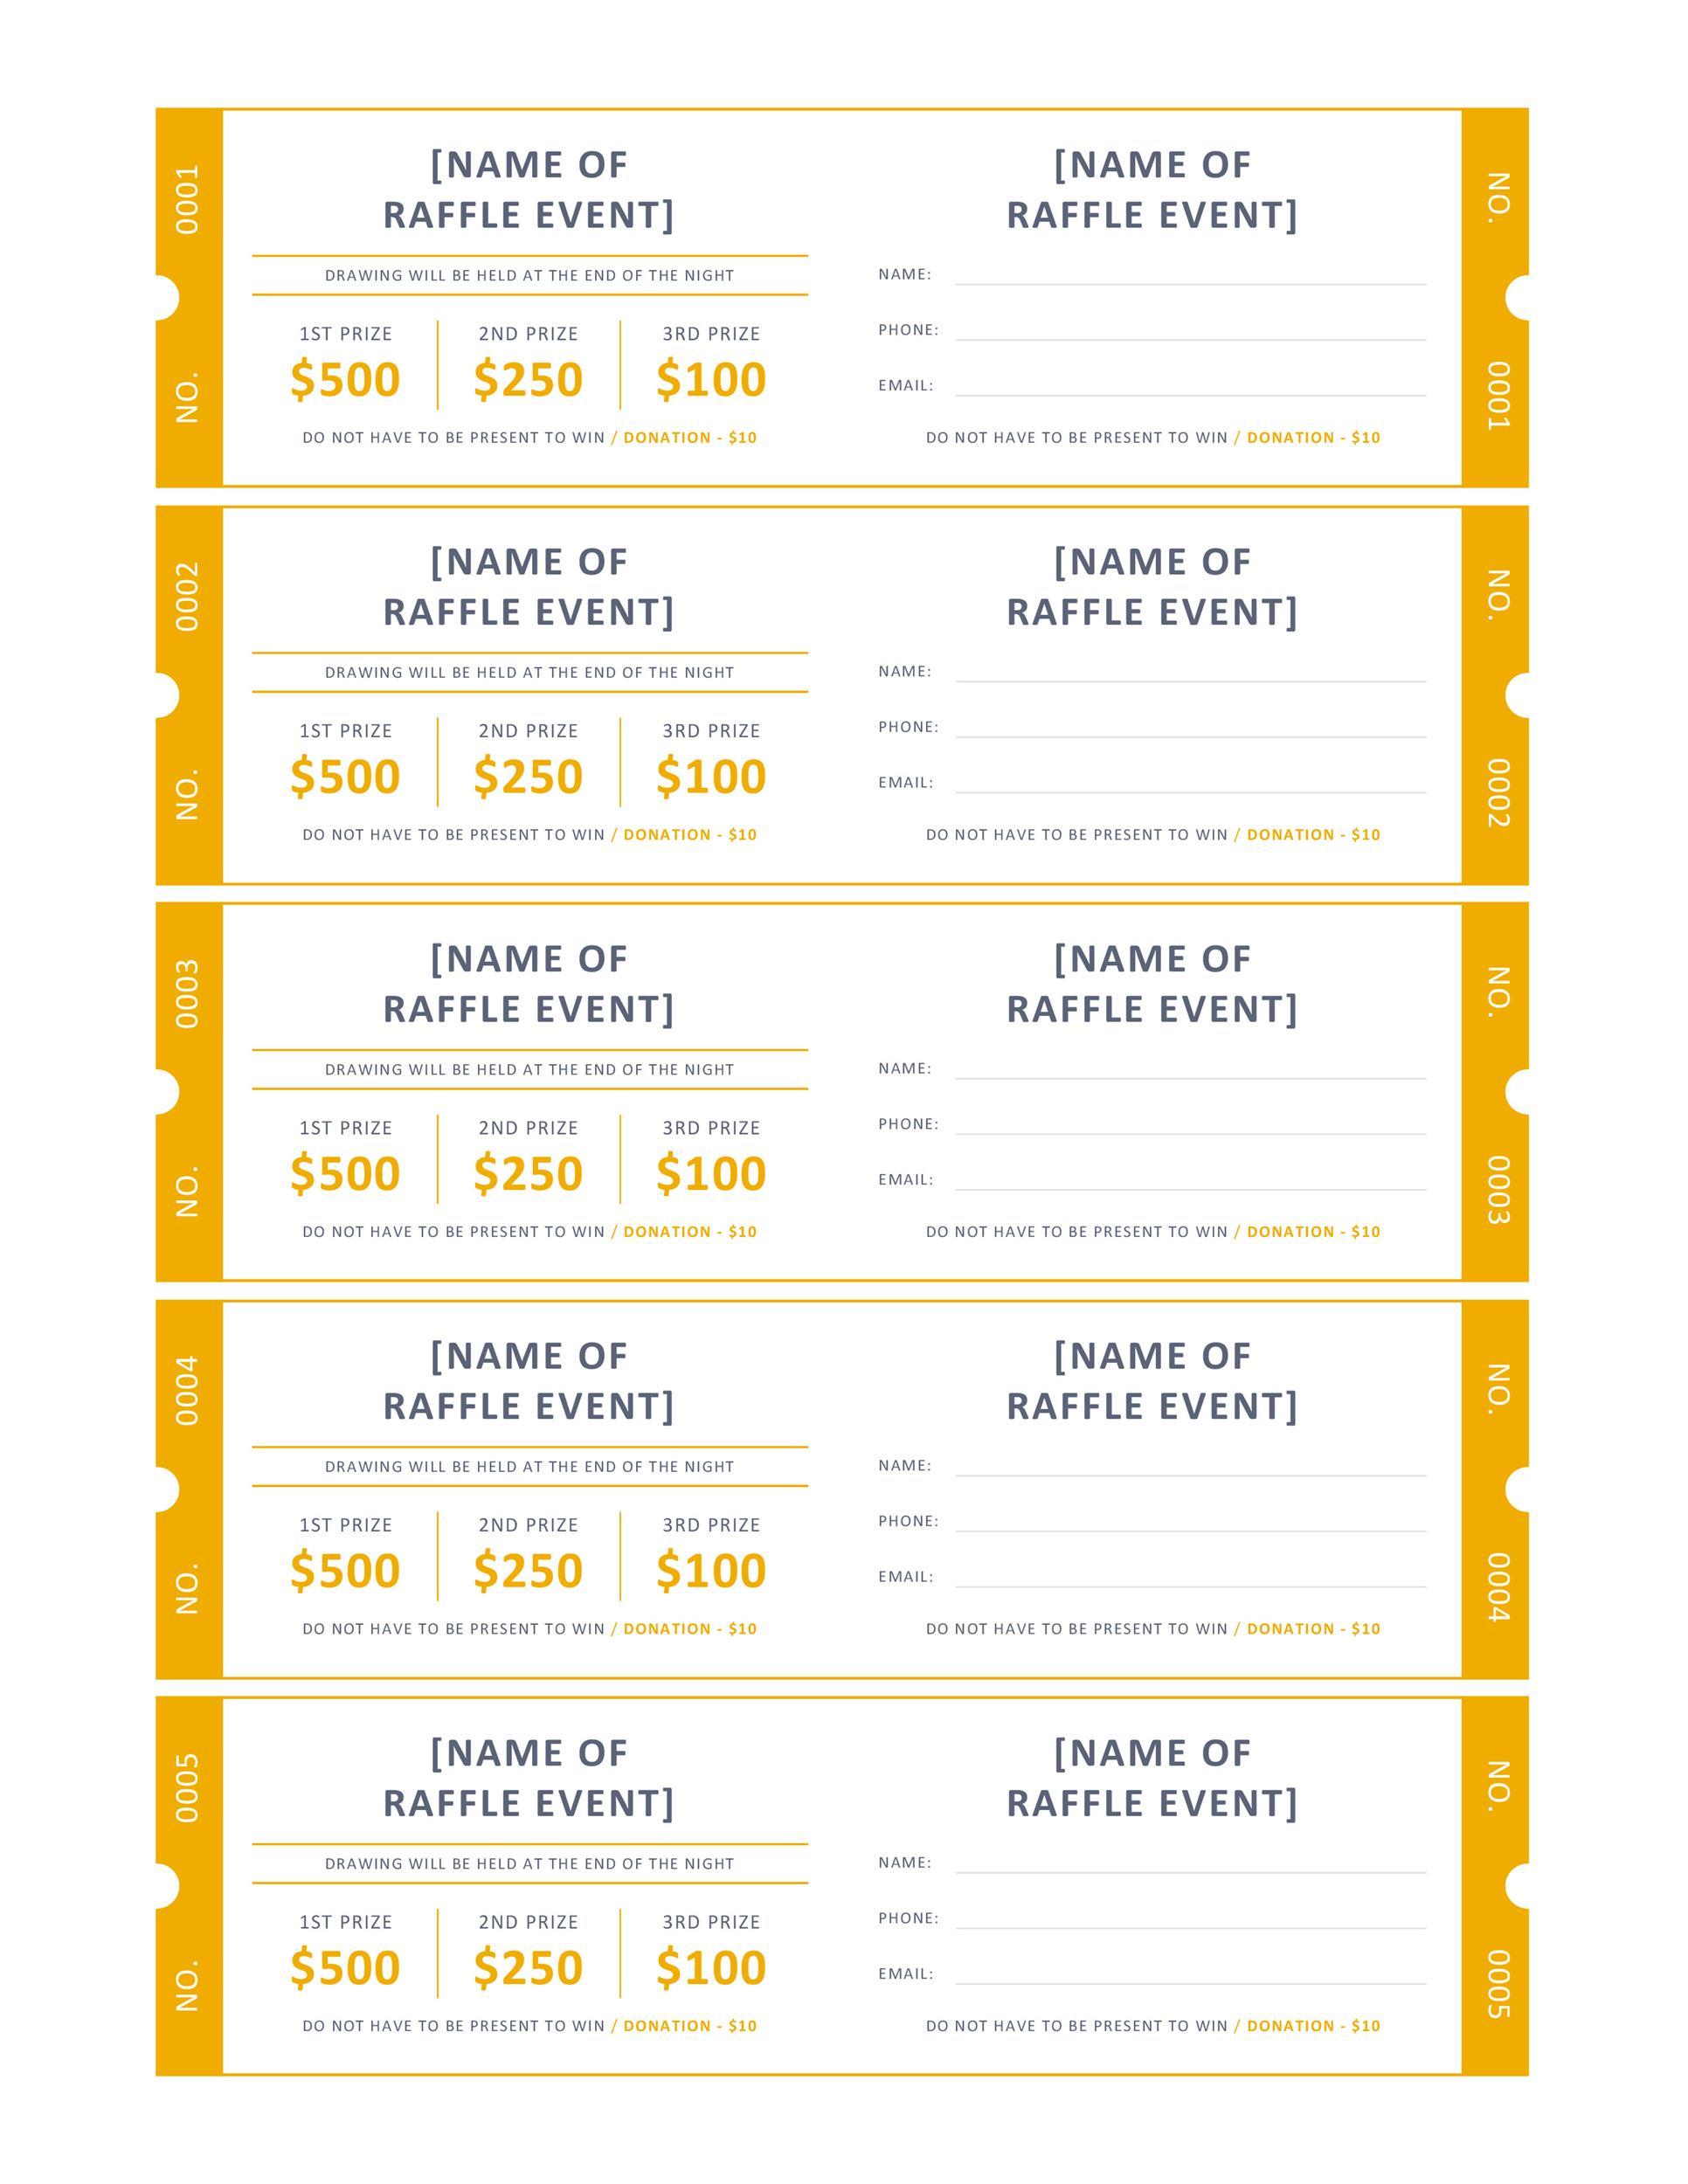 Free Raffle Ticket Templates 12